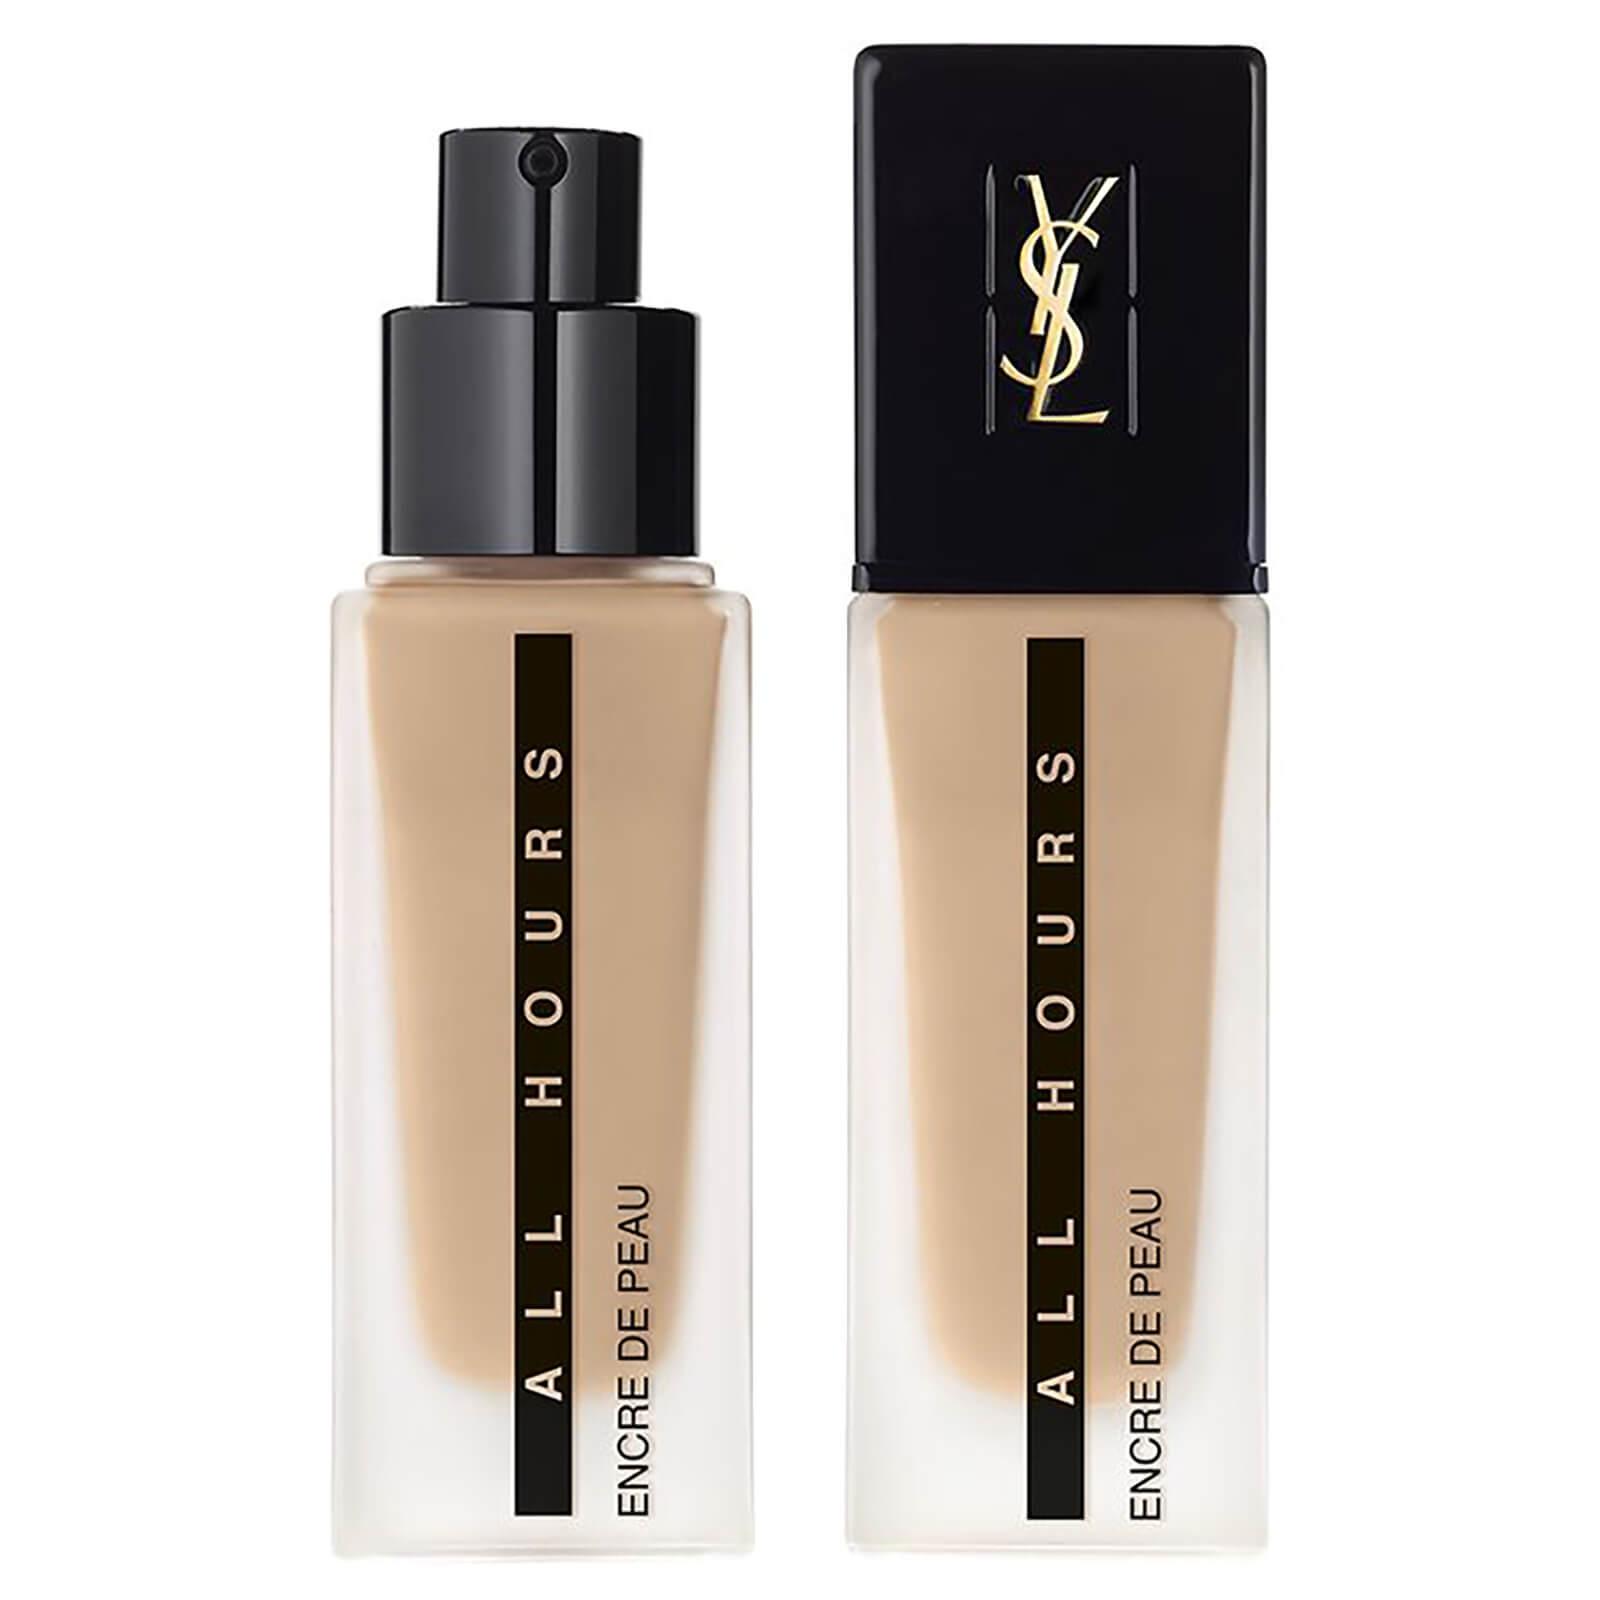 Yves Saint Laurent All Hours Liquid Foundation SPF20 25ml (Various Shades) - 34 B30